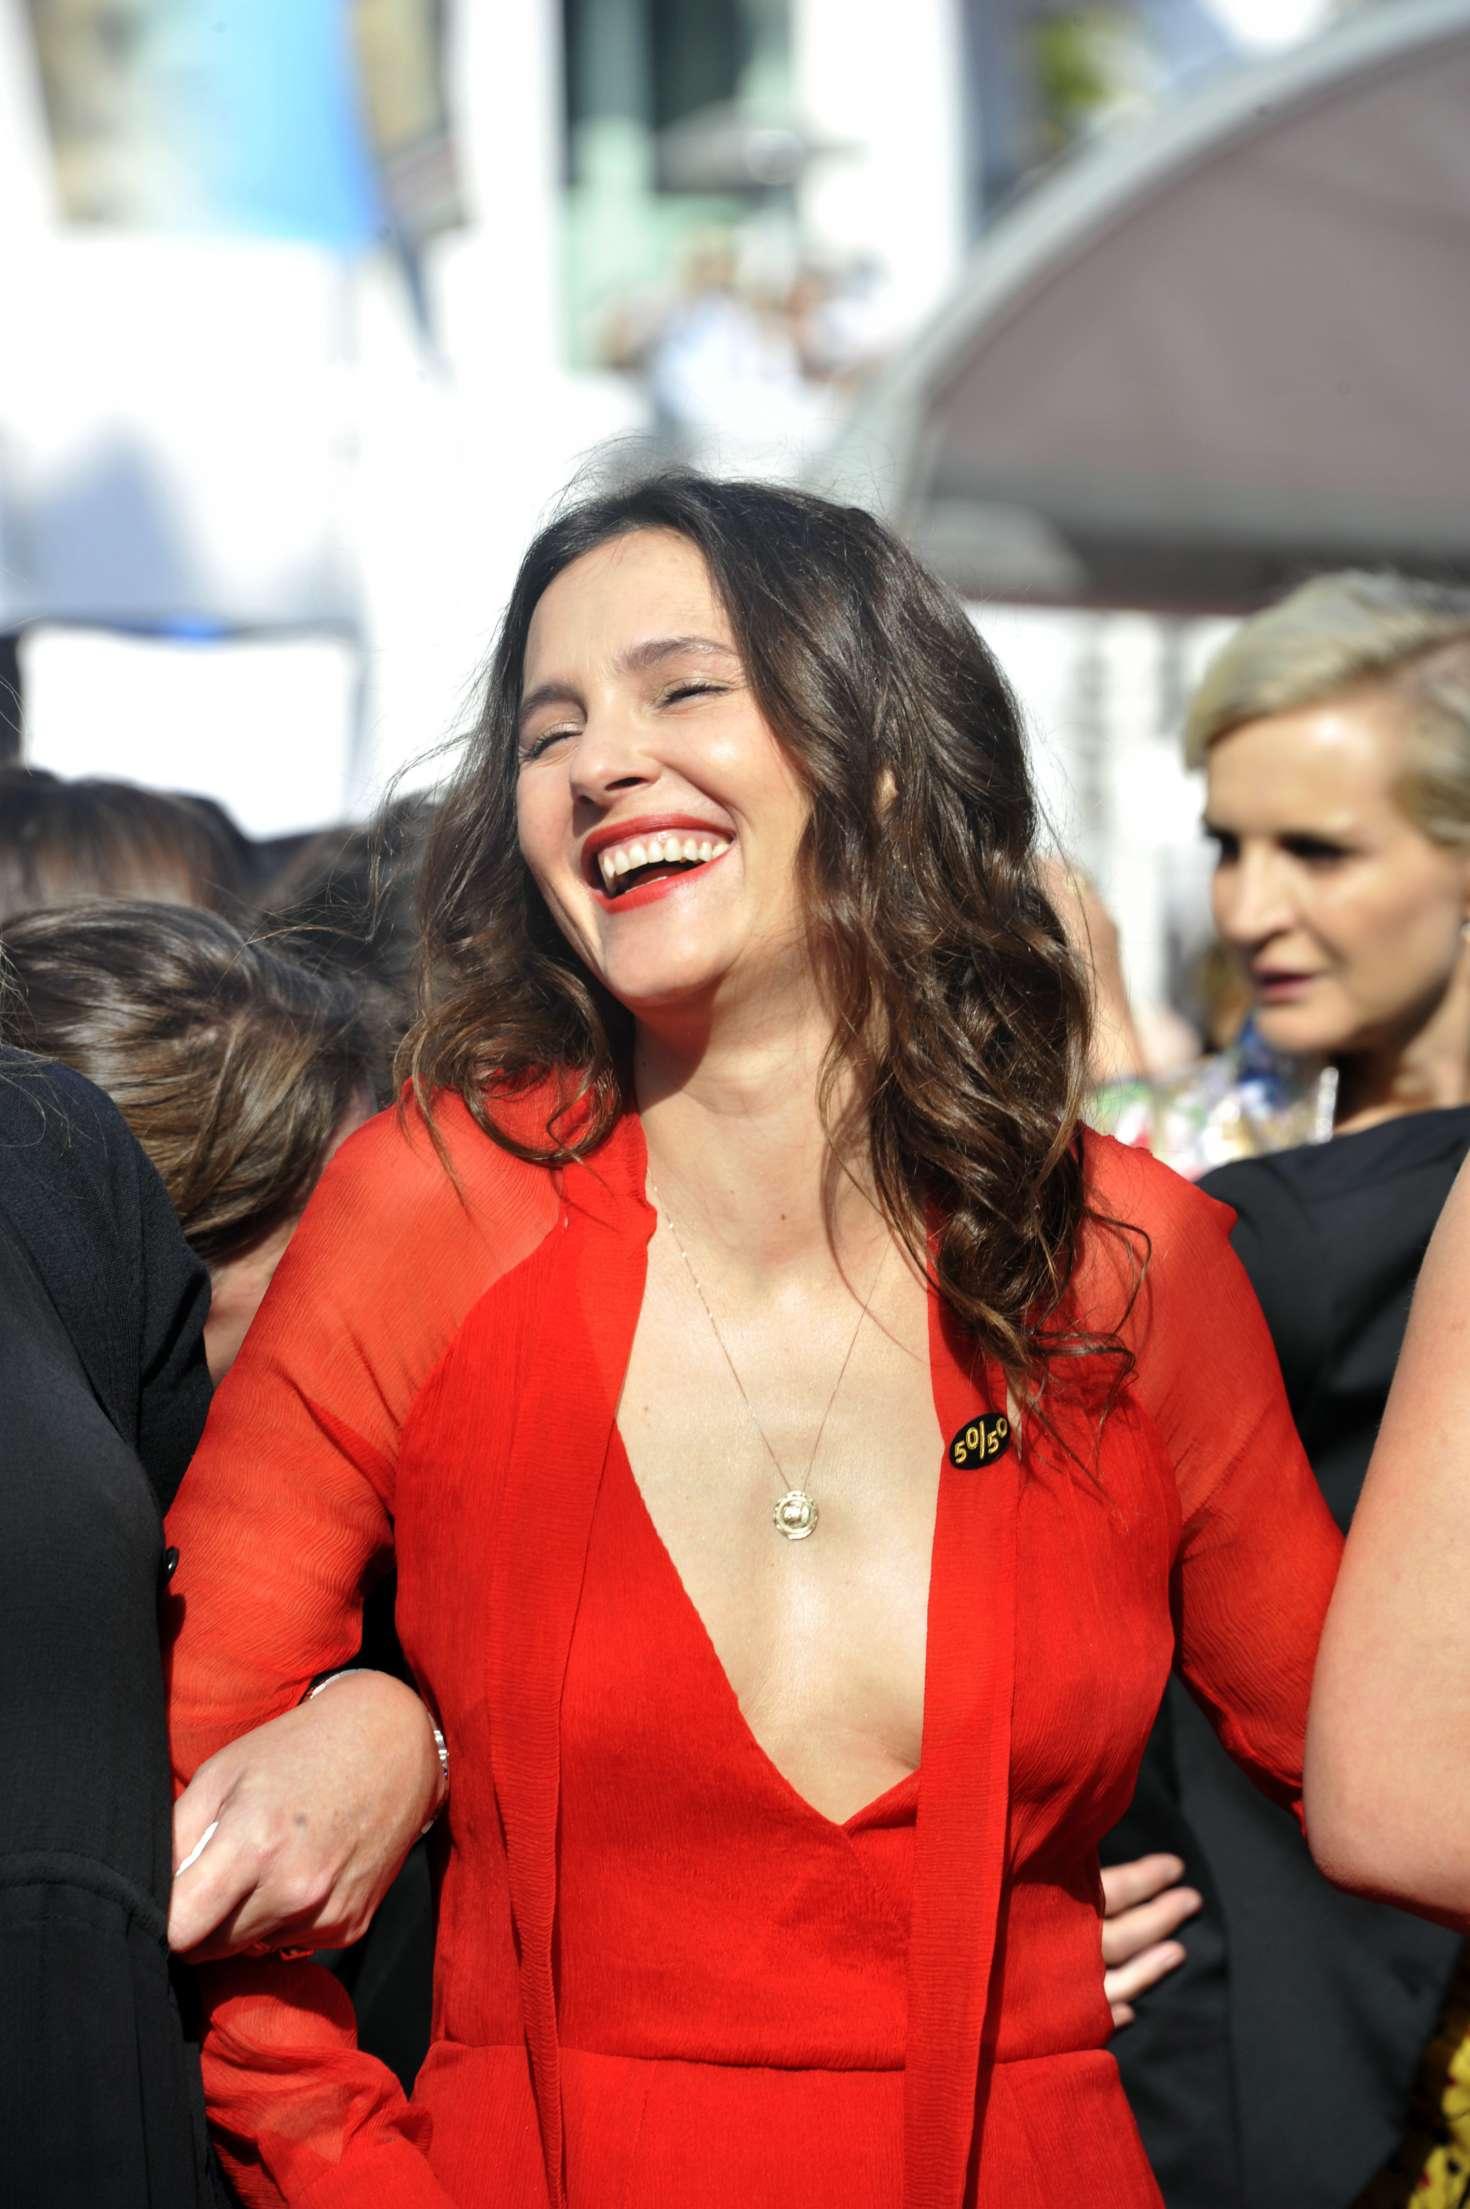 http://www.gotceleb.com/wp-content/uploads/photos/virginie-ledoyen/girls-of-the-sun-premiere-at-2018-cannes-film-festival/Virginie-Ledoyen:-Girls-Of-The-Sun-Premiere-at-2018-Cannes-Film-Festival--03.jpg